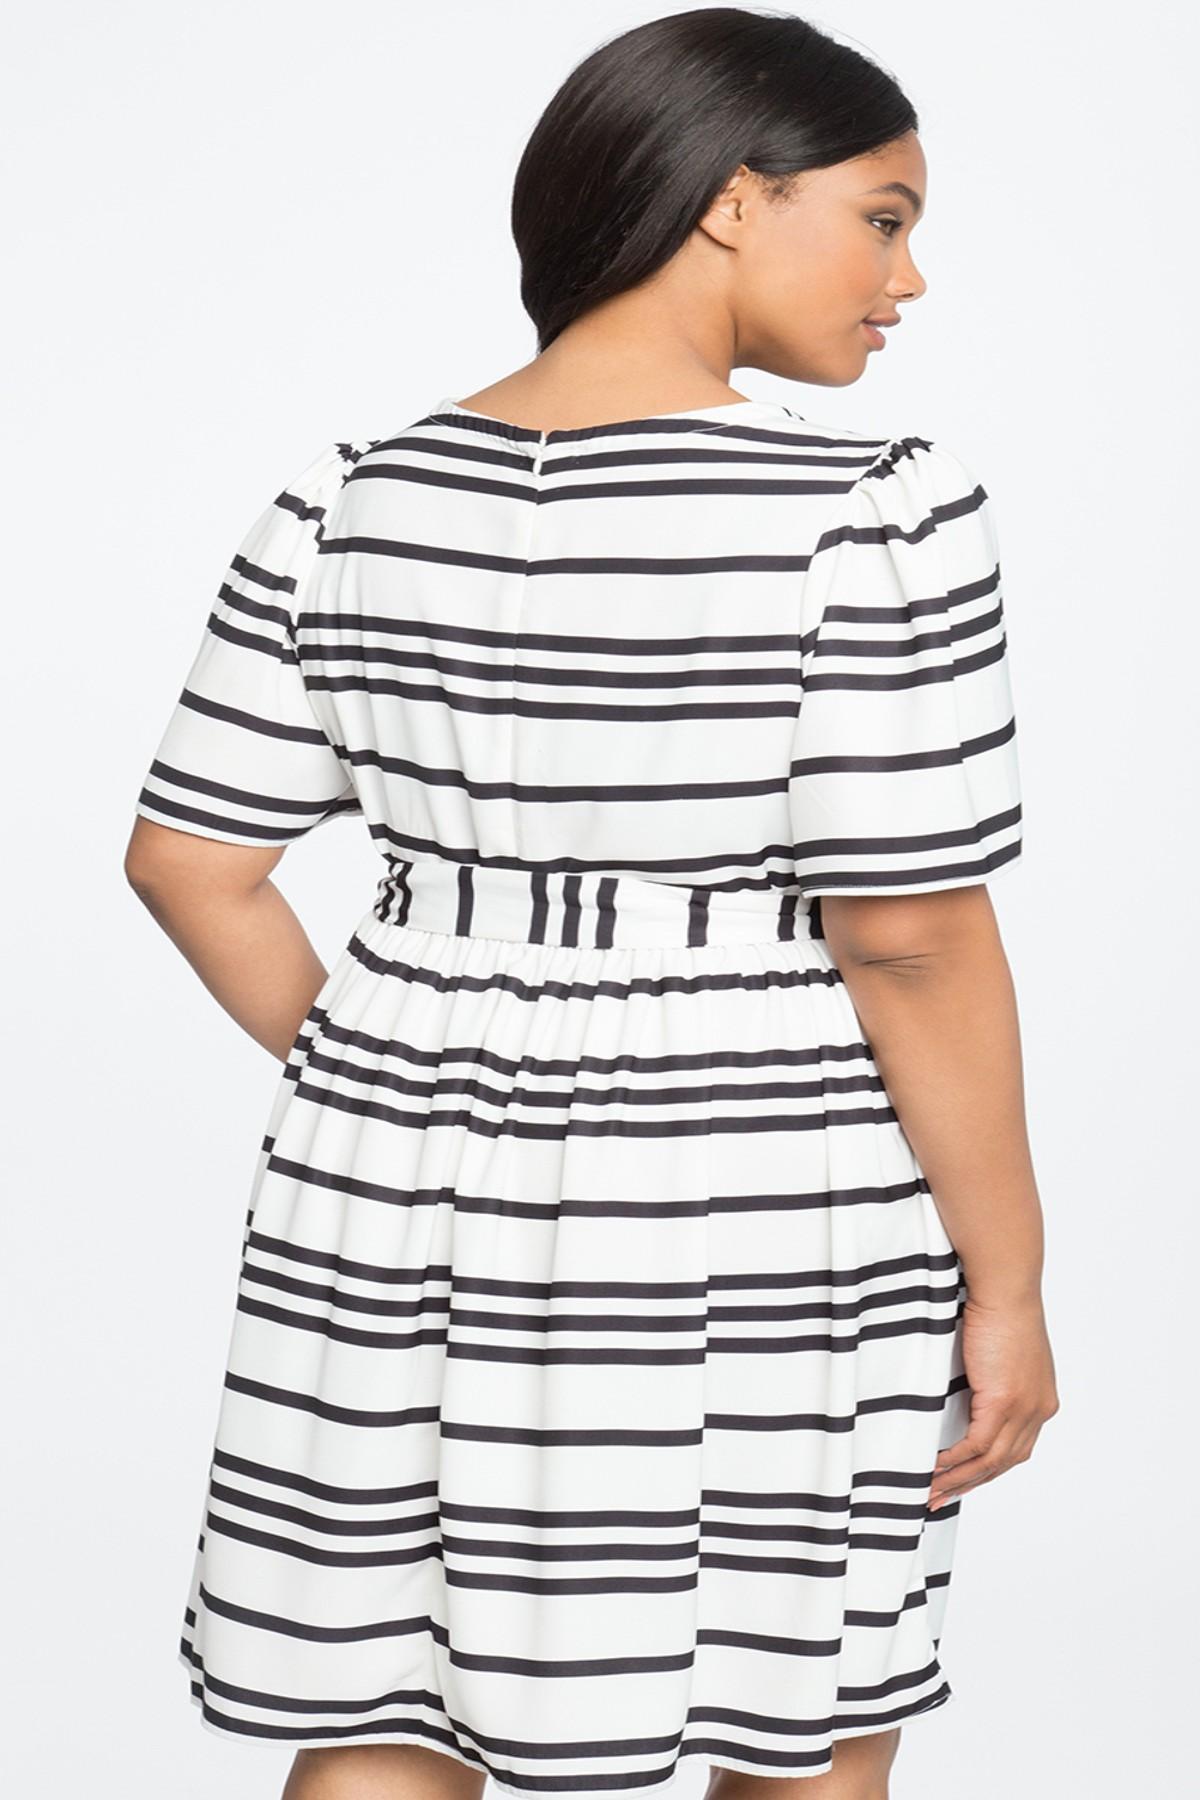 c5c4afbf77 Eloquii - White Circle Sleeve Fit   Flare Dress (plus Size) - Lyst. View  fullscreen